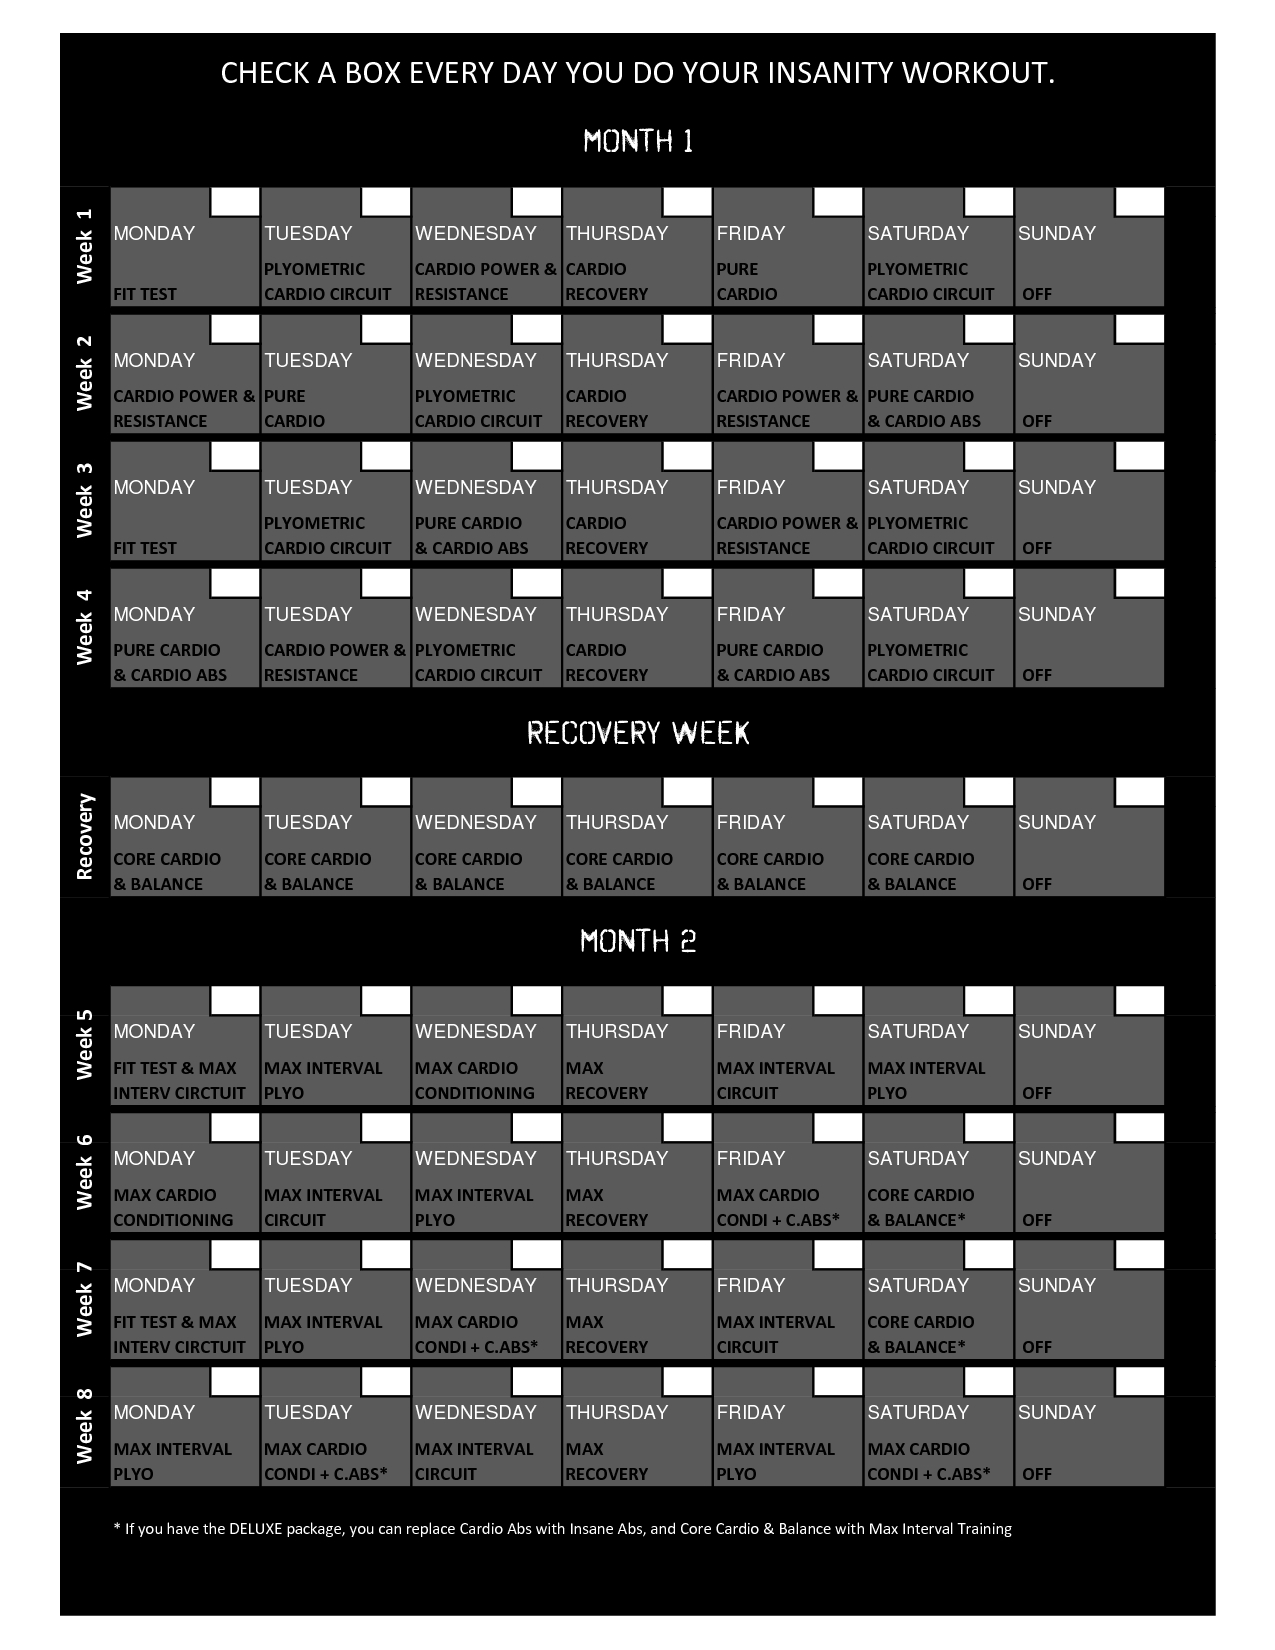 Printable Sample Insanity Workout Calendar Form | Workout